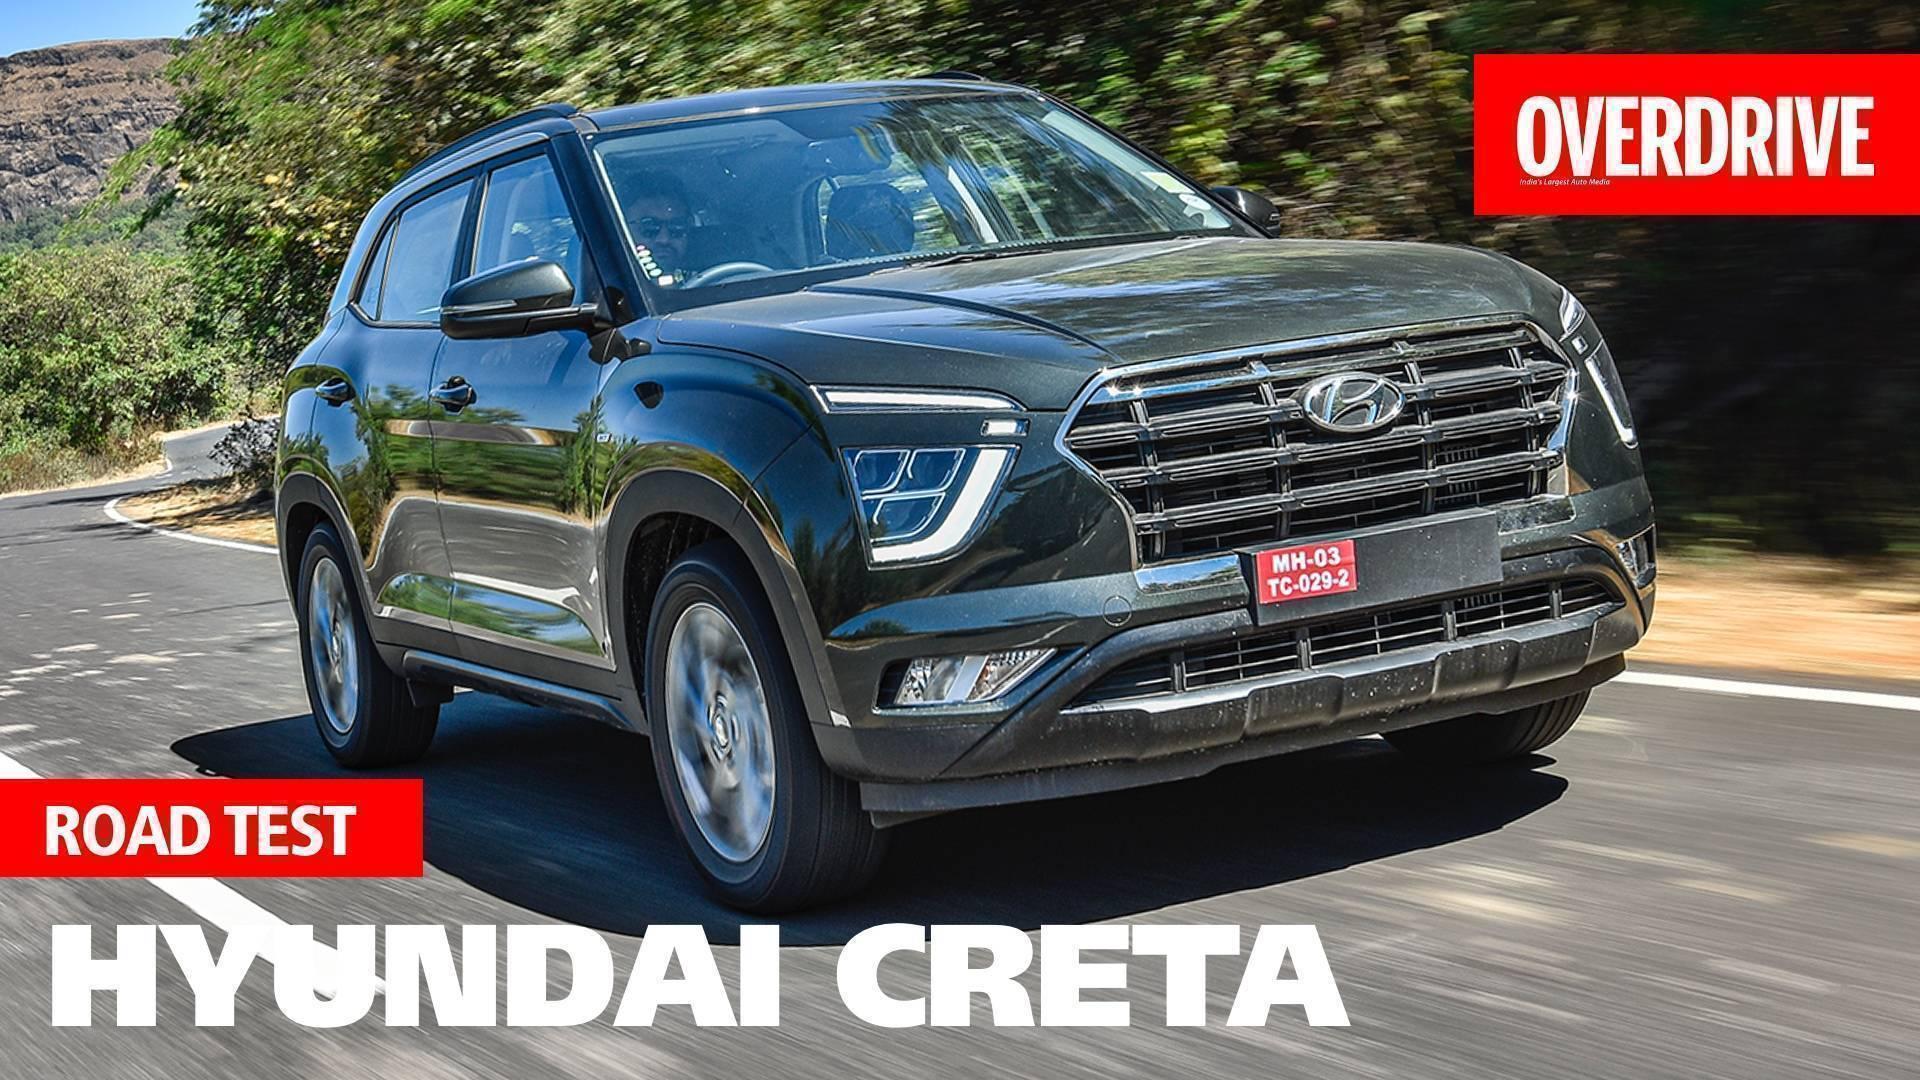 2020 Hyundai Creta - Road Test